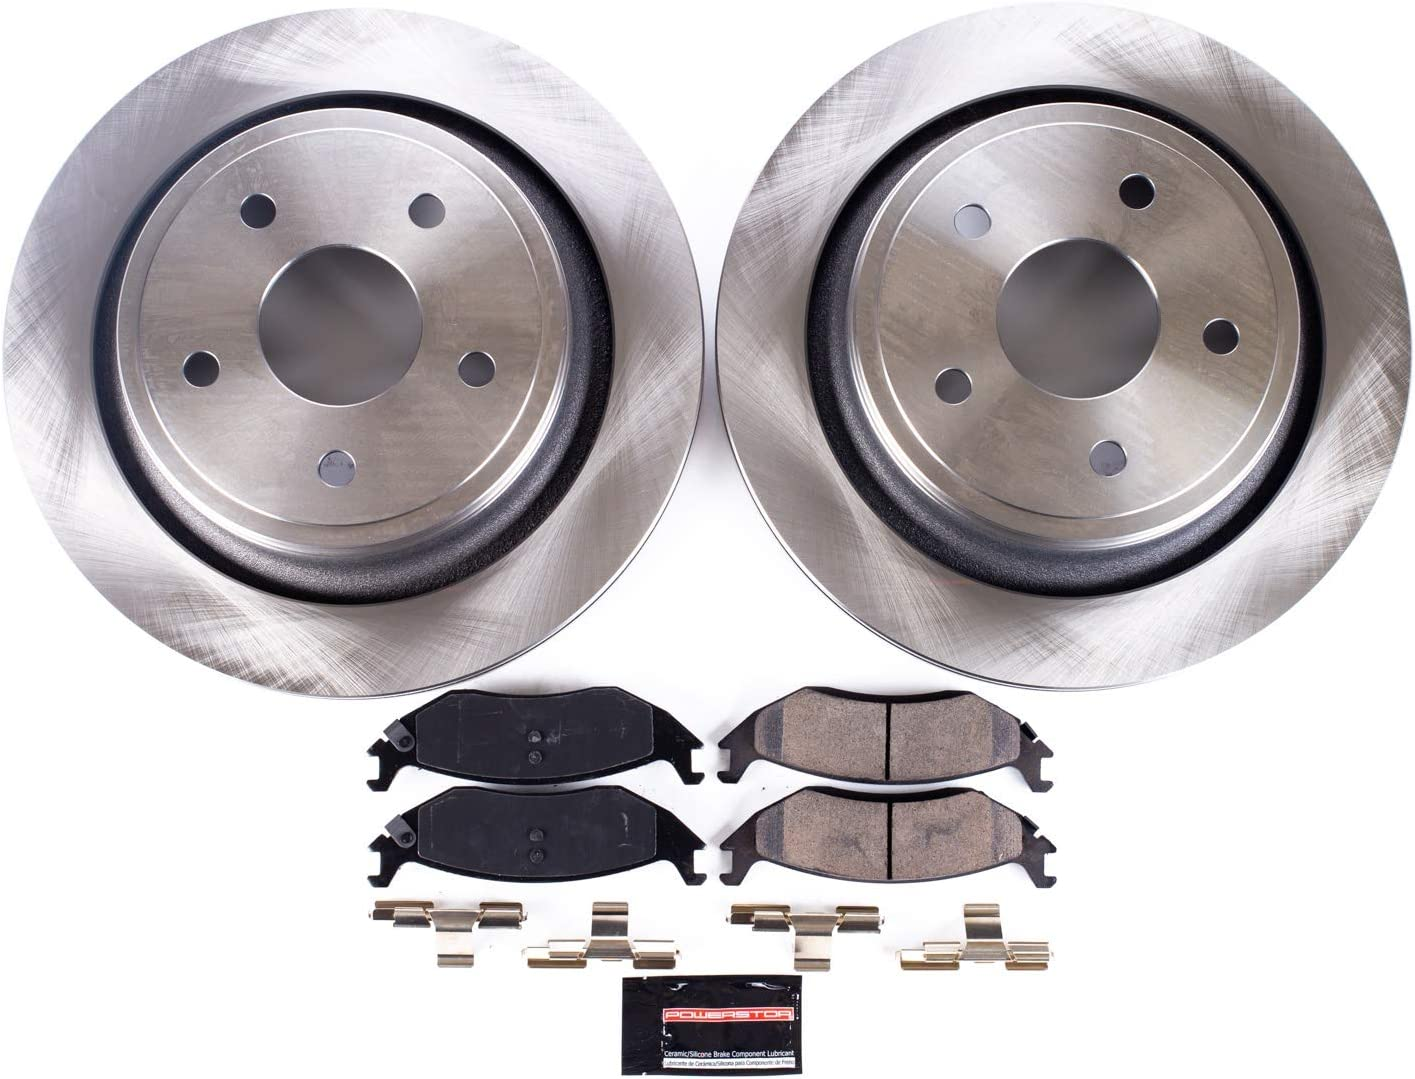 Power Stop KOE7716 Autospecailty Replacement Rear Kit-Stock Rotors and Ceramic Brake Pads